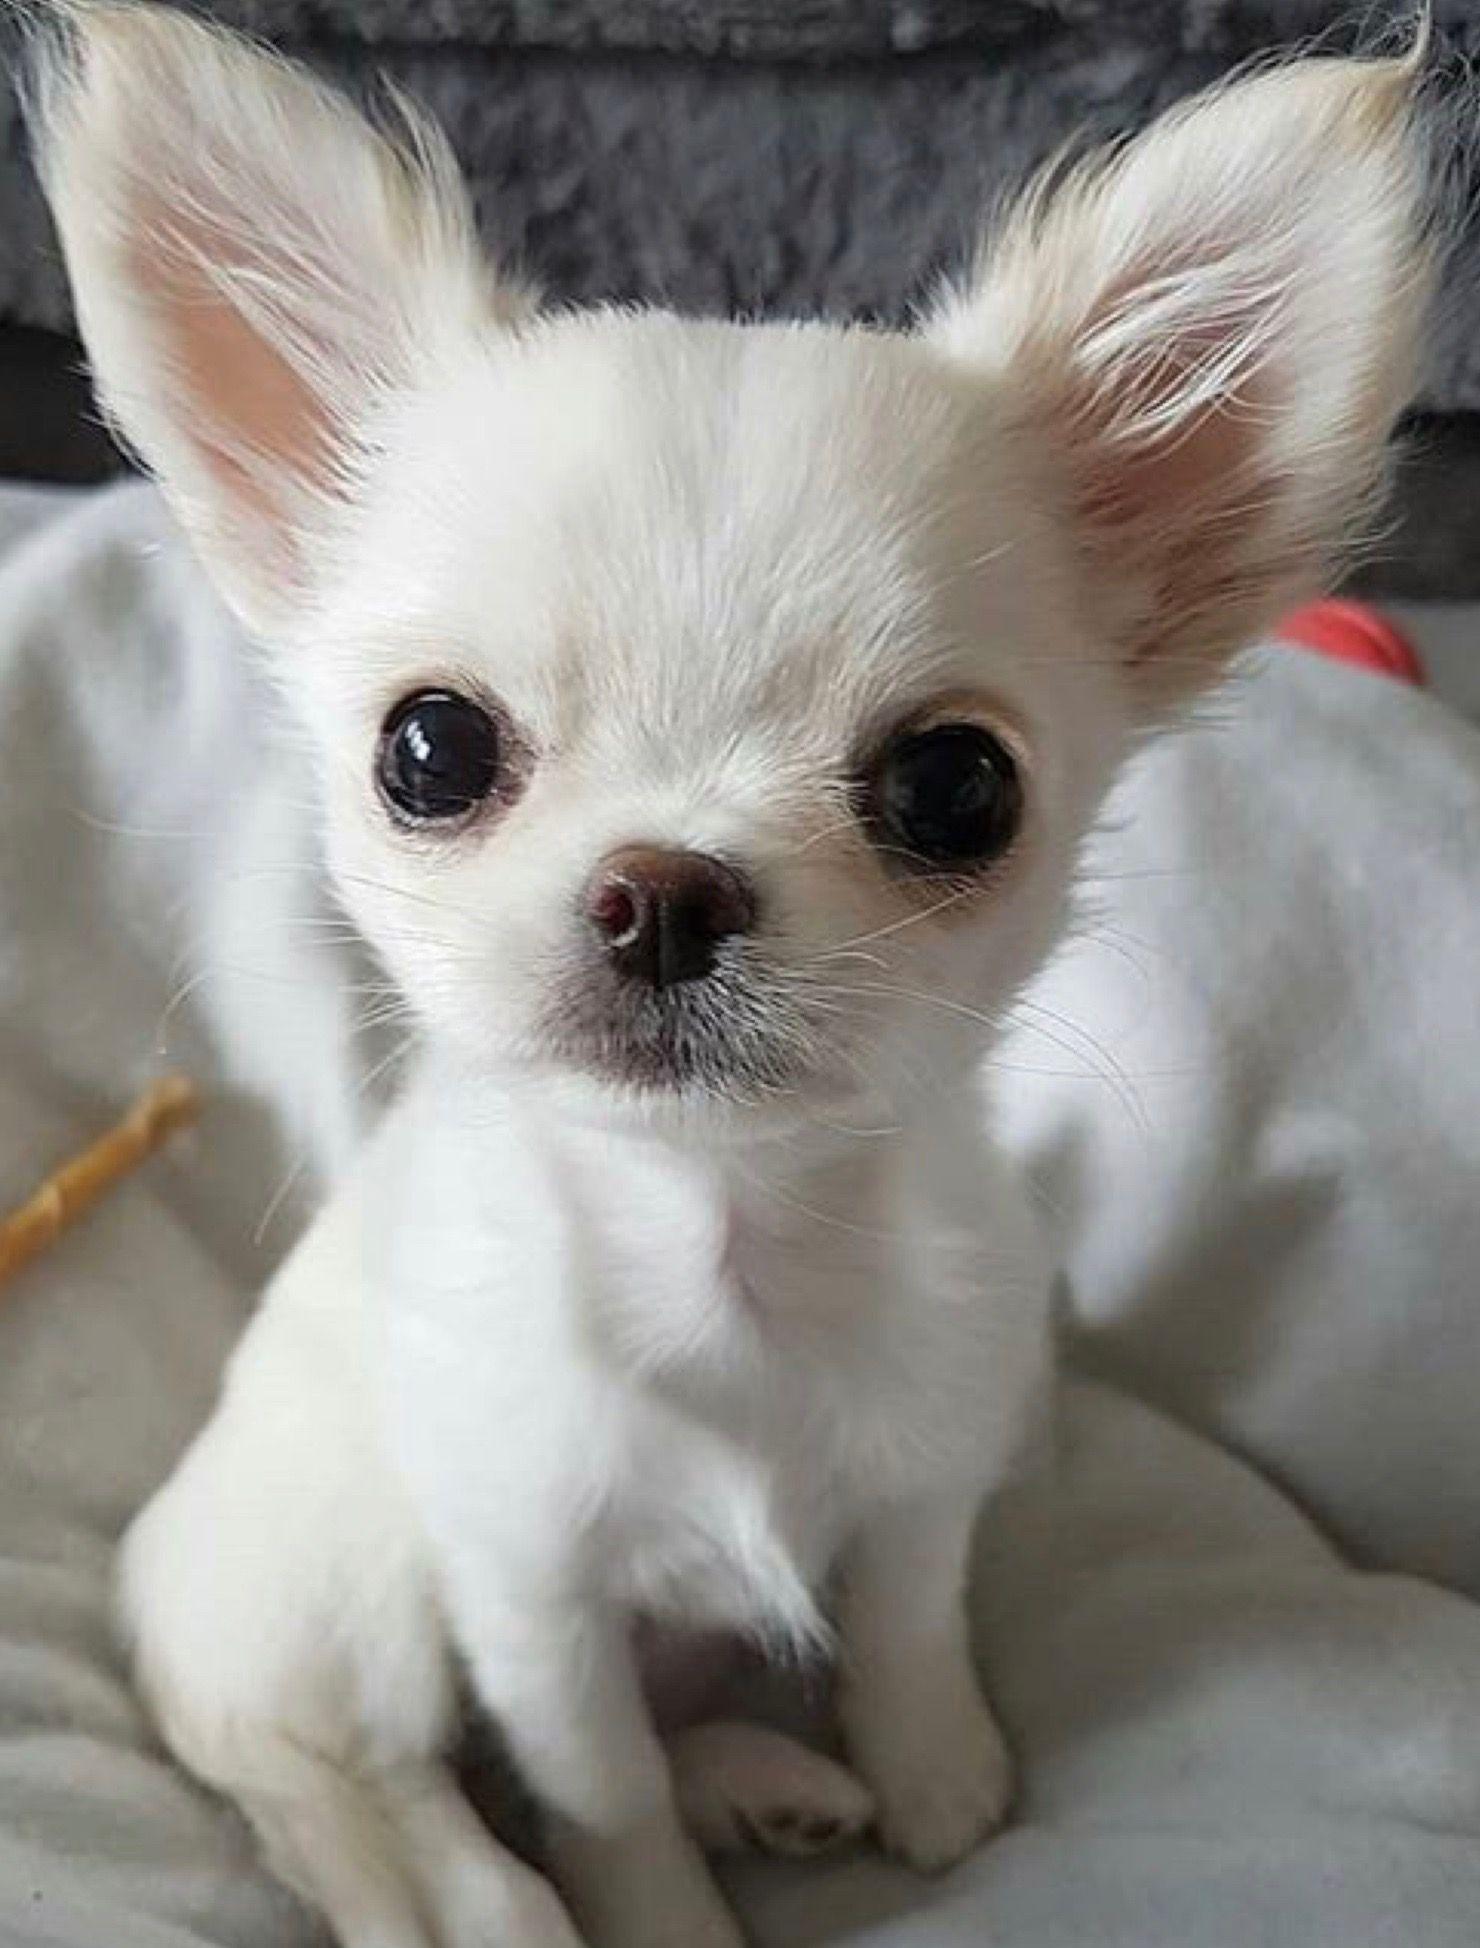 Chihuahua Fofinho Demais Morri Chihuahua Puppies